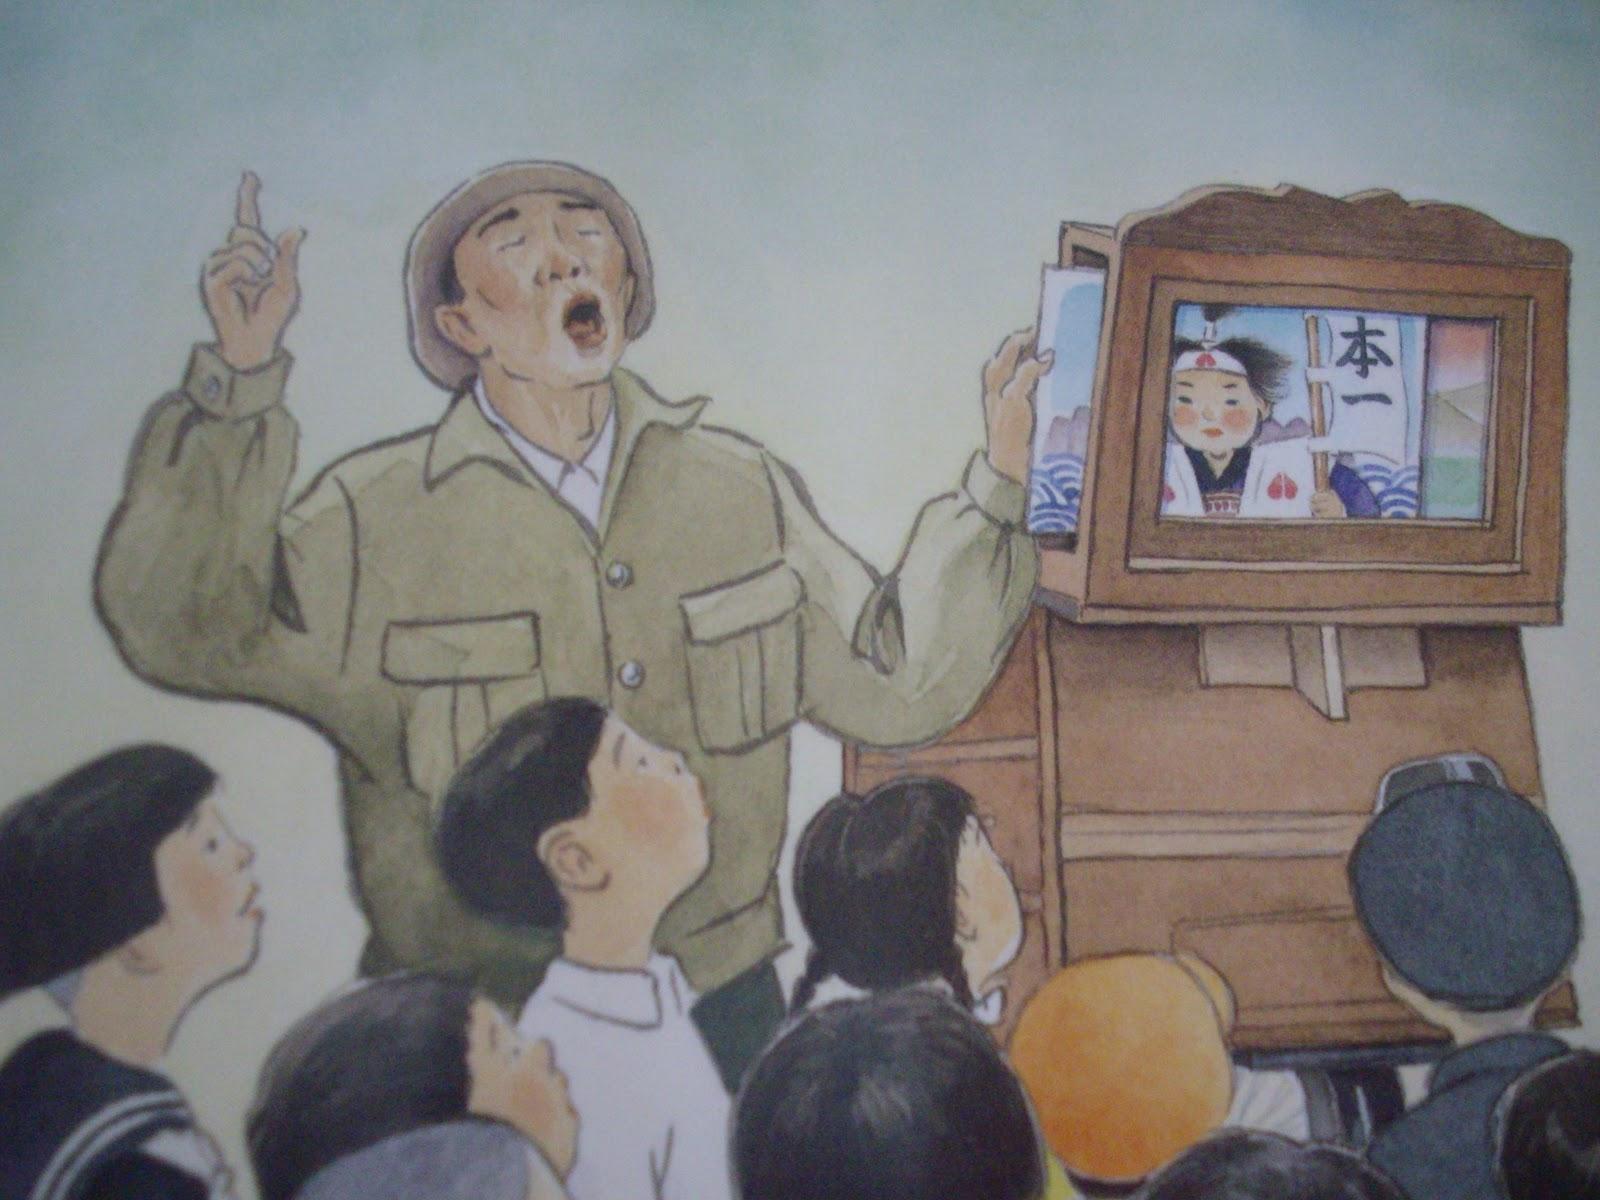 Homeschoolingdownunder: Kamishibai Man